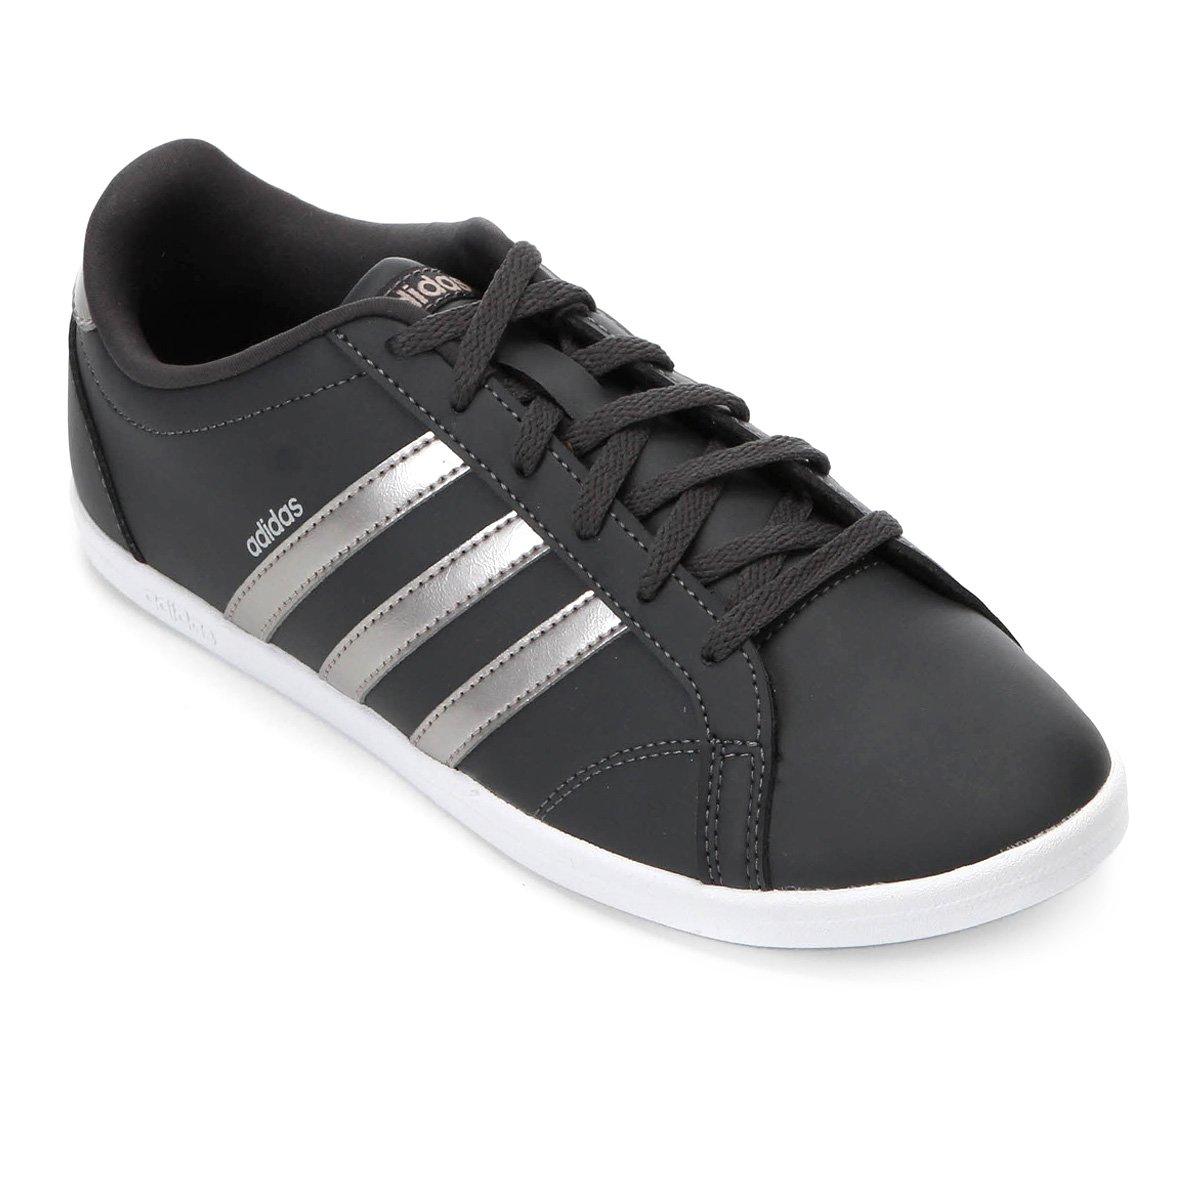 f5745863bd Tênis Adidas Coneo Qt Feminino - Preto e Prata